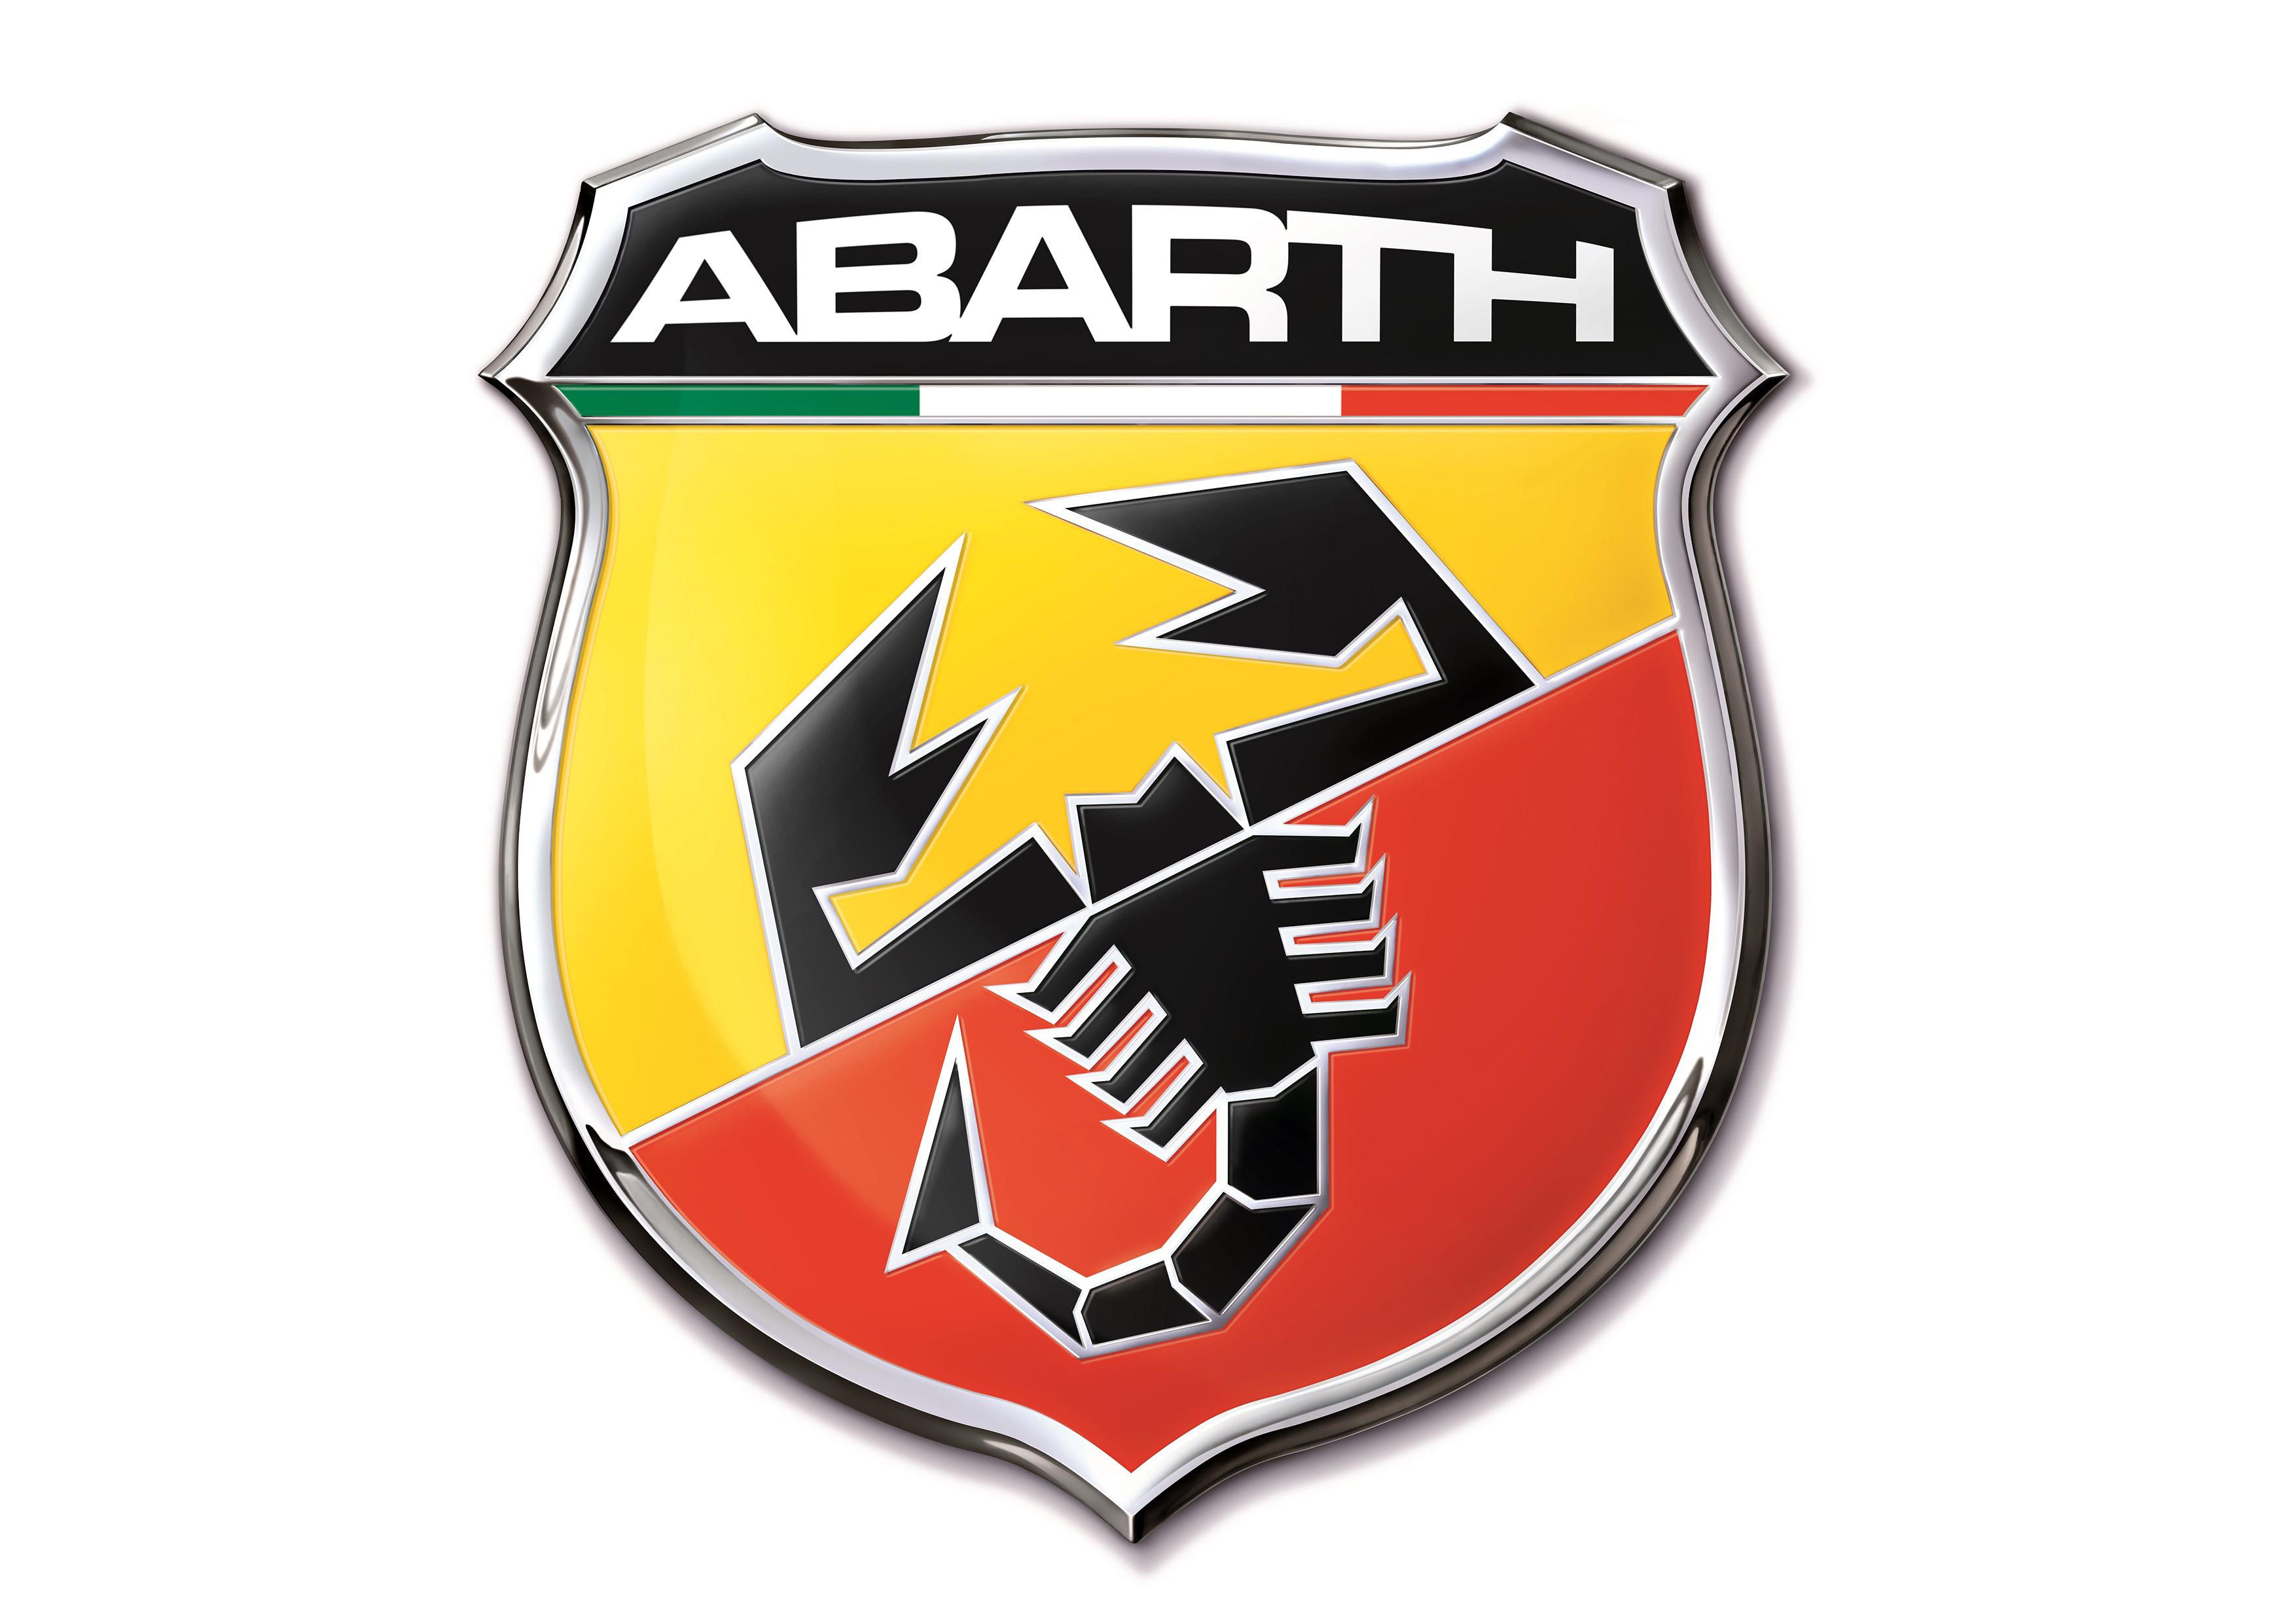 Garage Rotondo Alfa Romeo Fiat Lancia Hendschiken Logo Neu Abarth Servicestelle